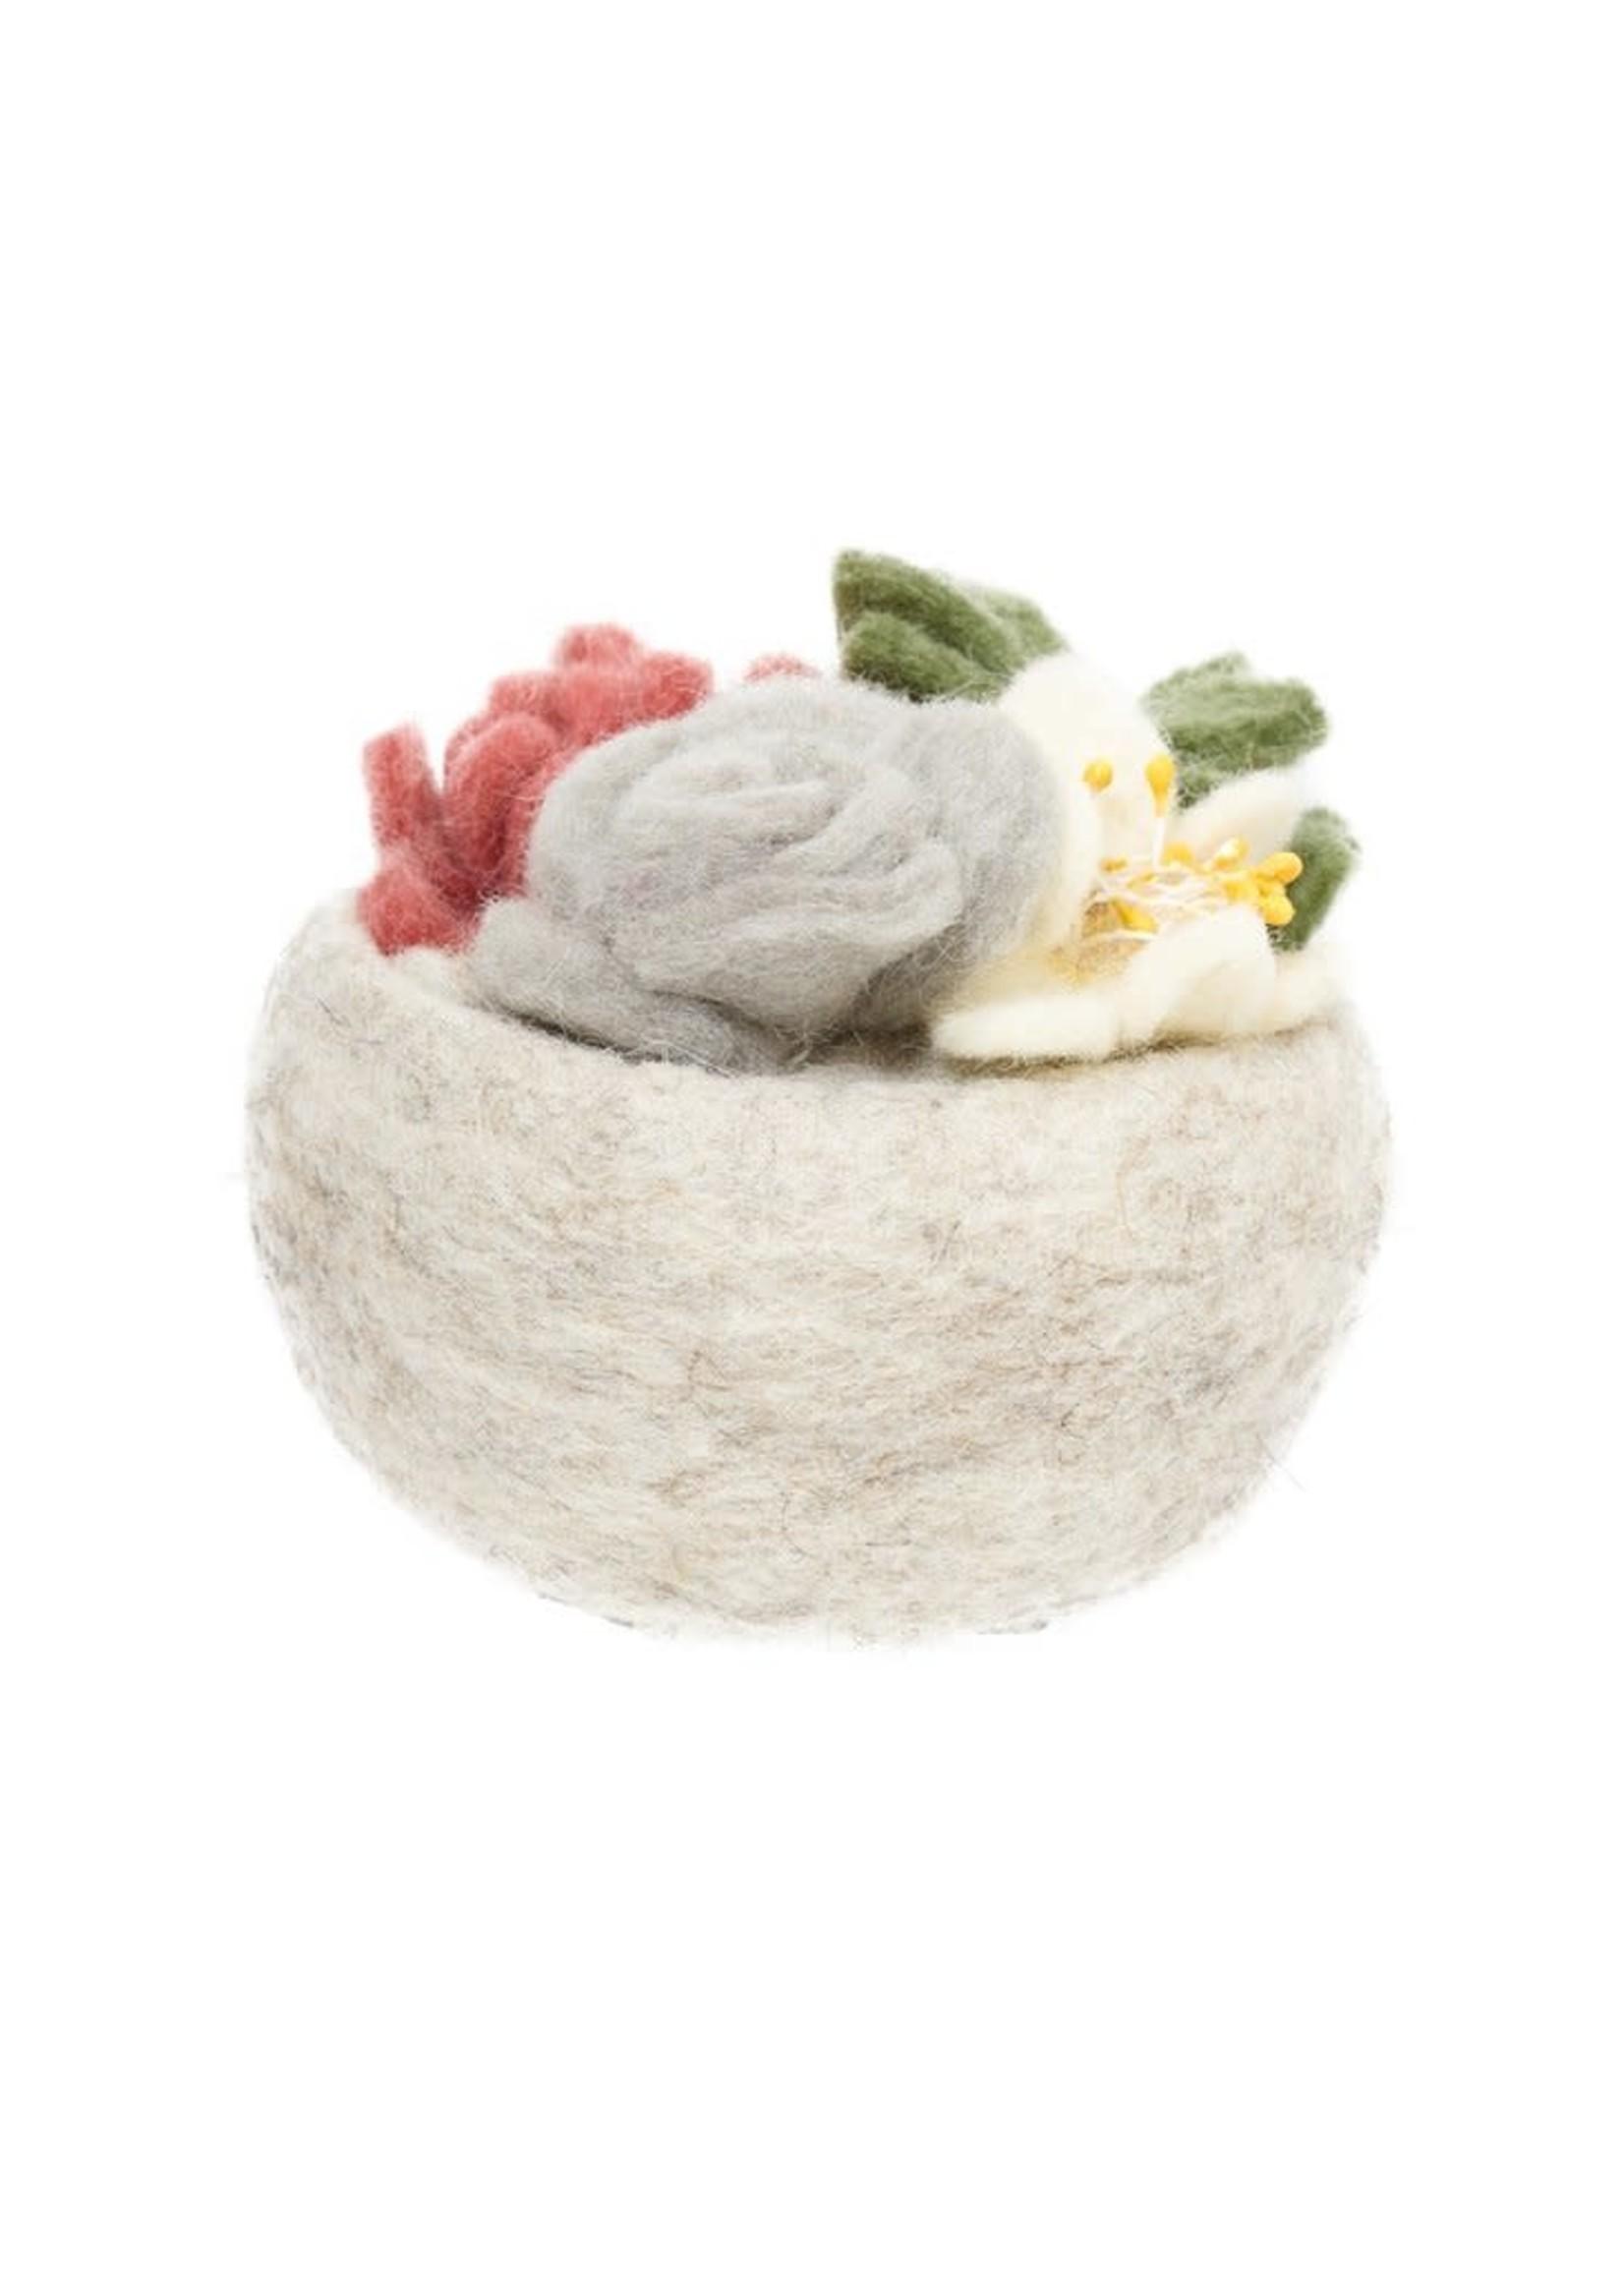 Global Goods Partners Grey Rose Succulent Bowl